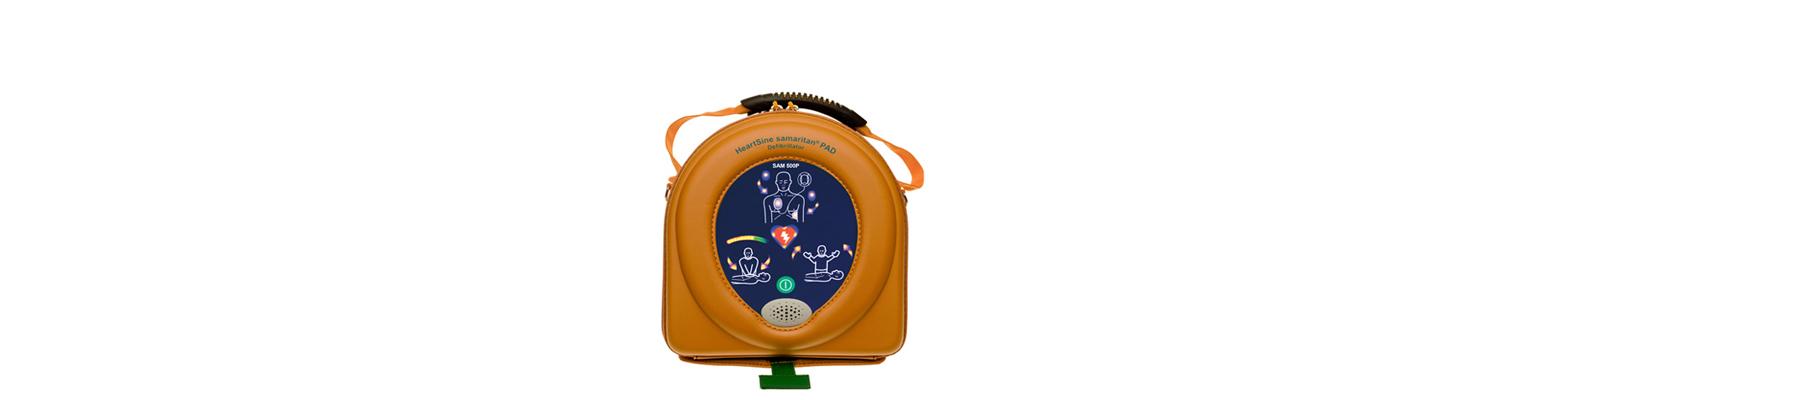 defibrillators-first-aid-3